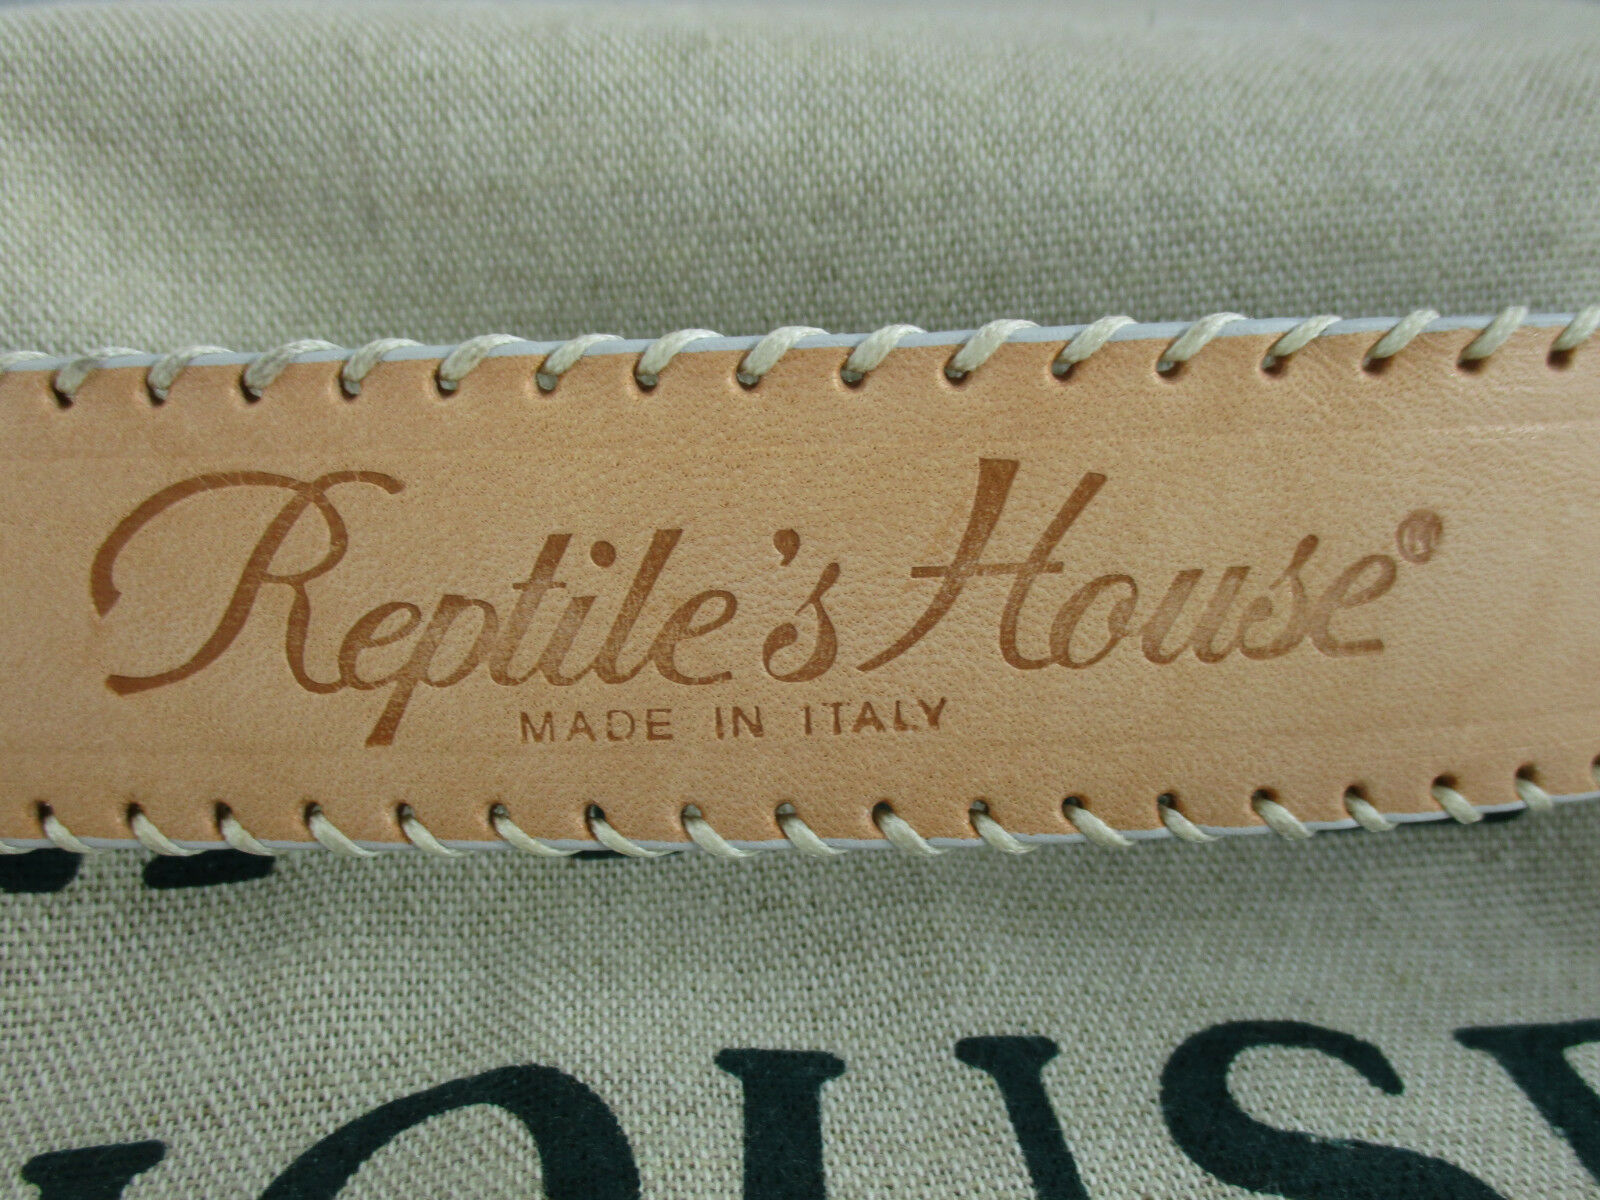 Reptile's House House House Original Leguan  Gürtel mit Schliesse Damengürtel neu RHGE-08   | Üppiges Design  46d4f7